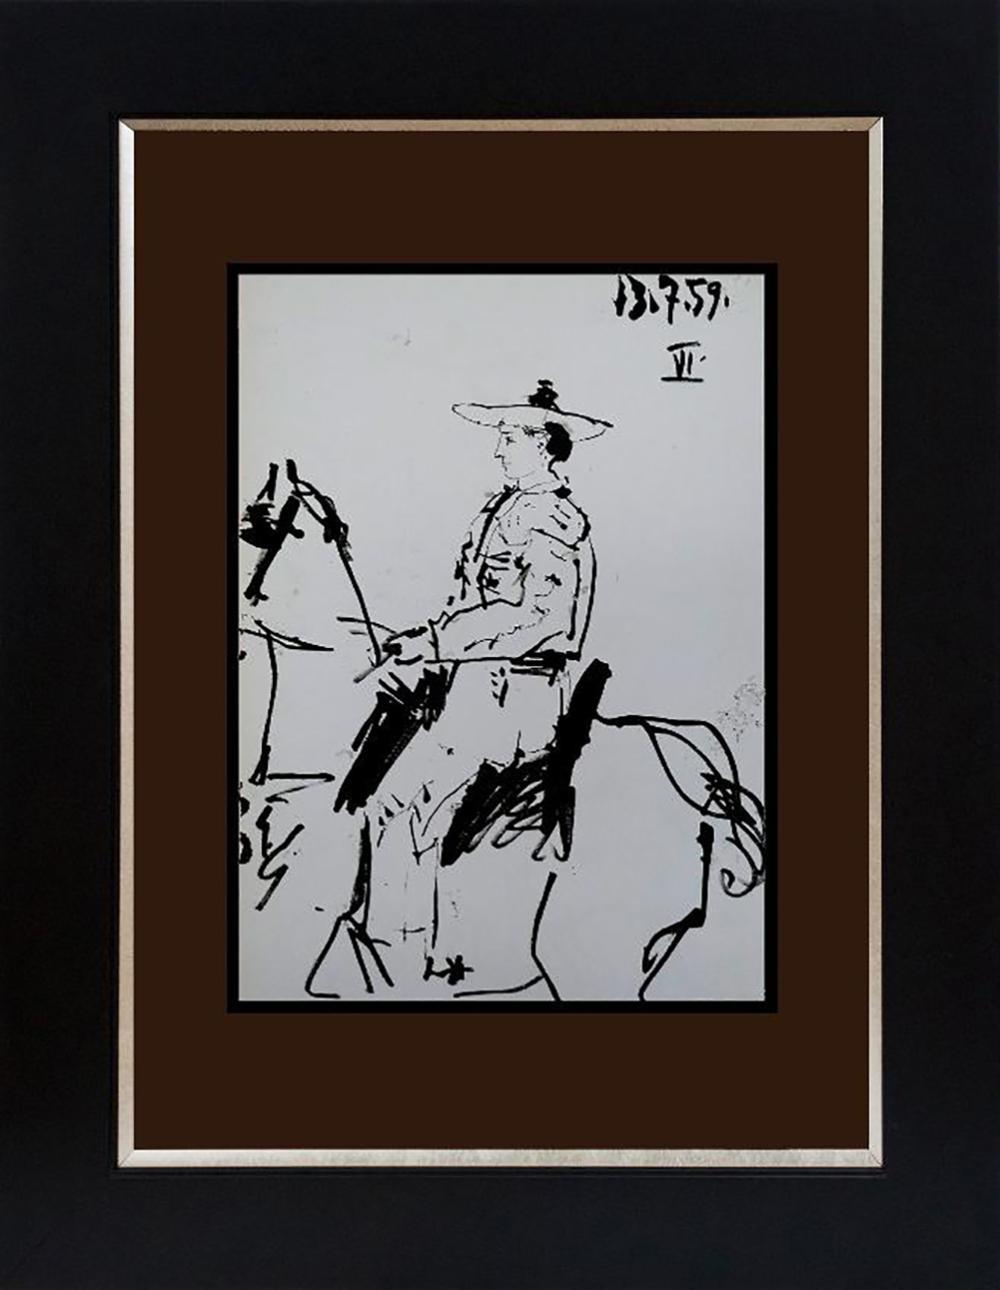 Lot 7088: Pablo Picasso lithograph